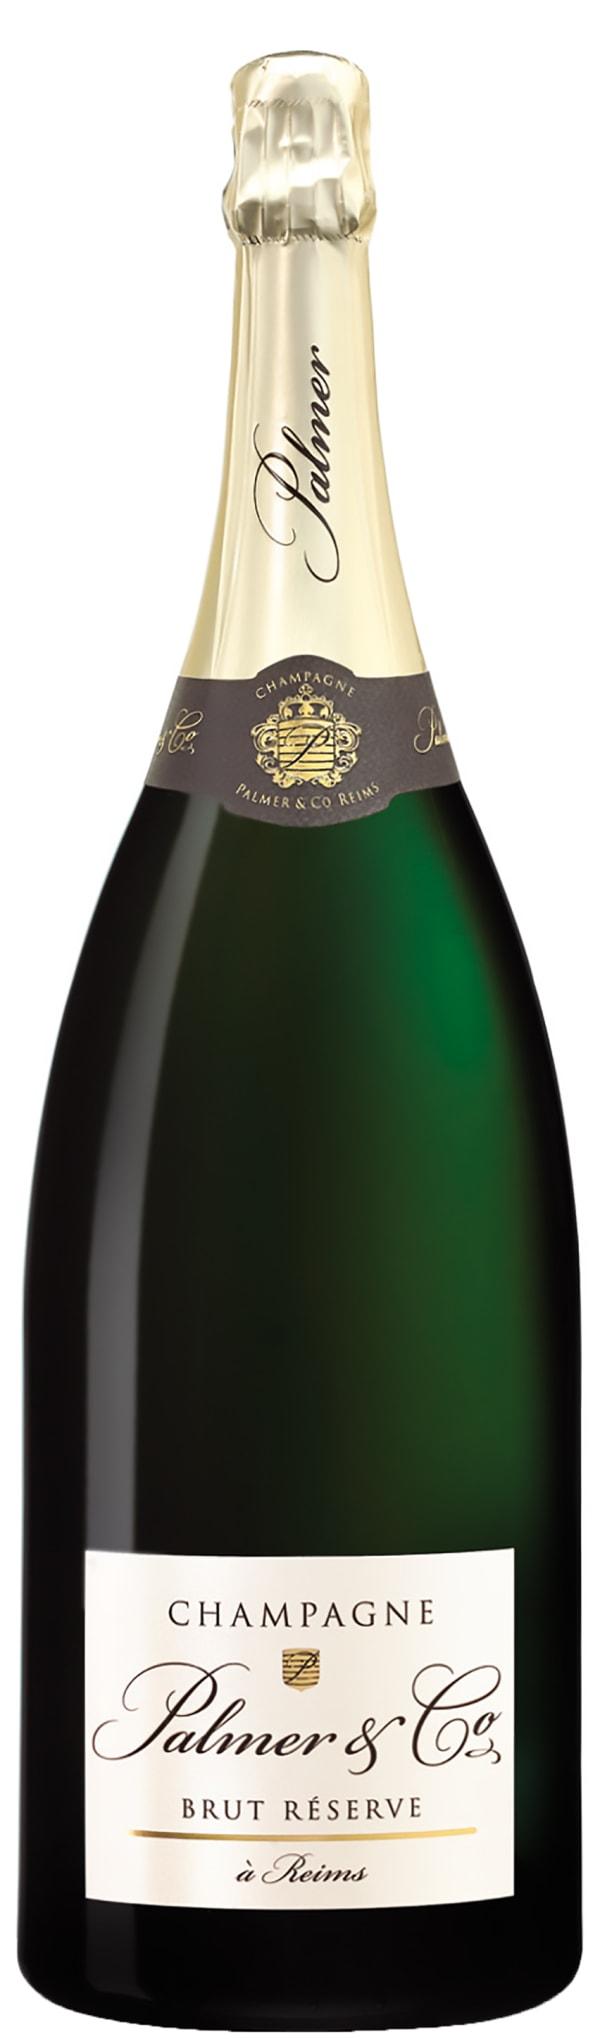 Palmer & Co Réserve Jeroboam Champagne Brut